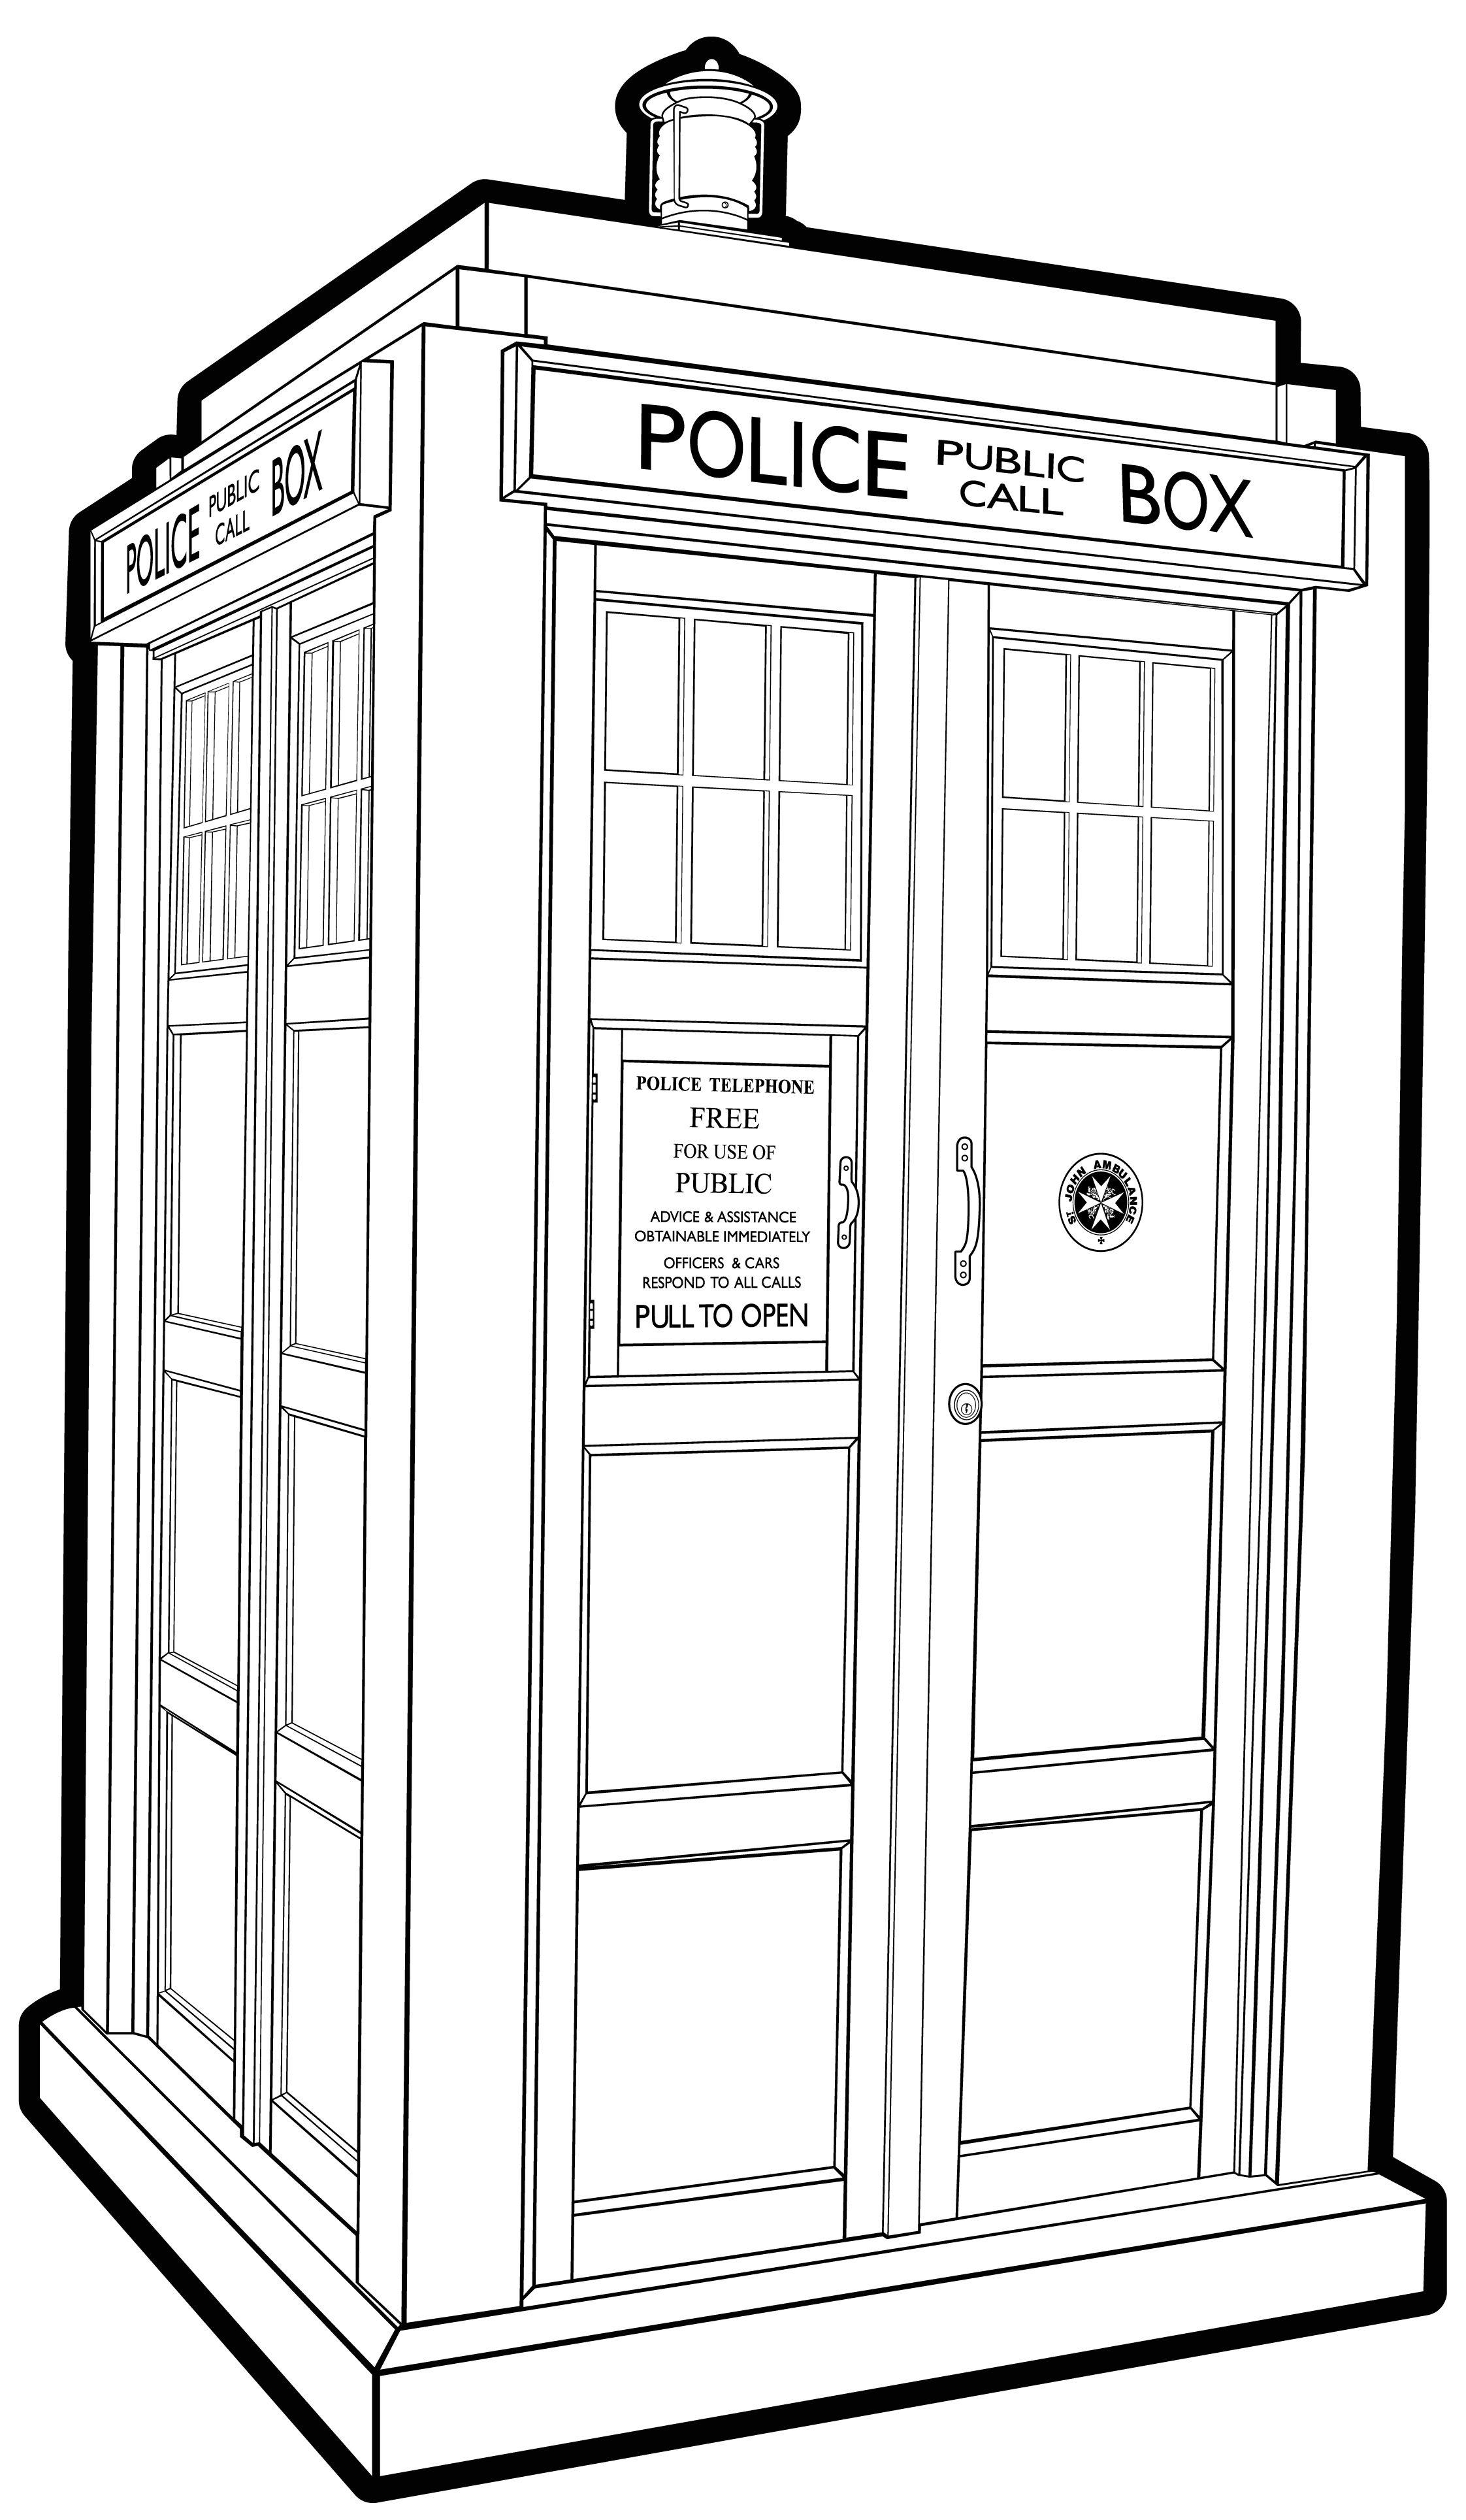 Doctor Who Tardis Ex B W V 2 By Spgk On Deviantart Doctor Who Fan Art Tardis Art Doctor Who Art